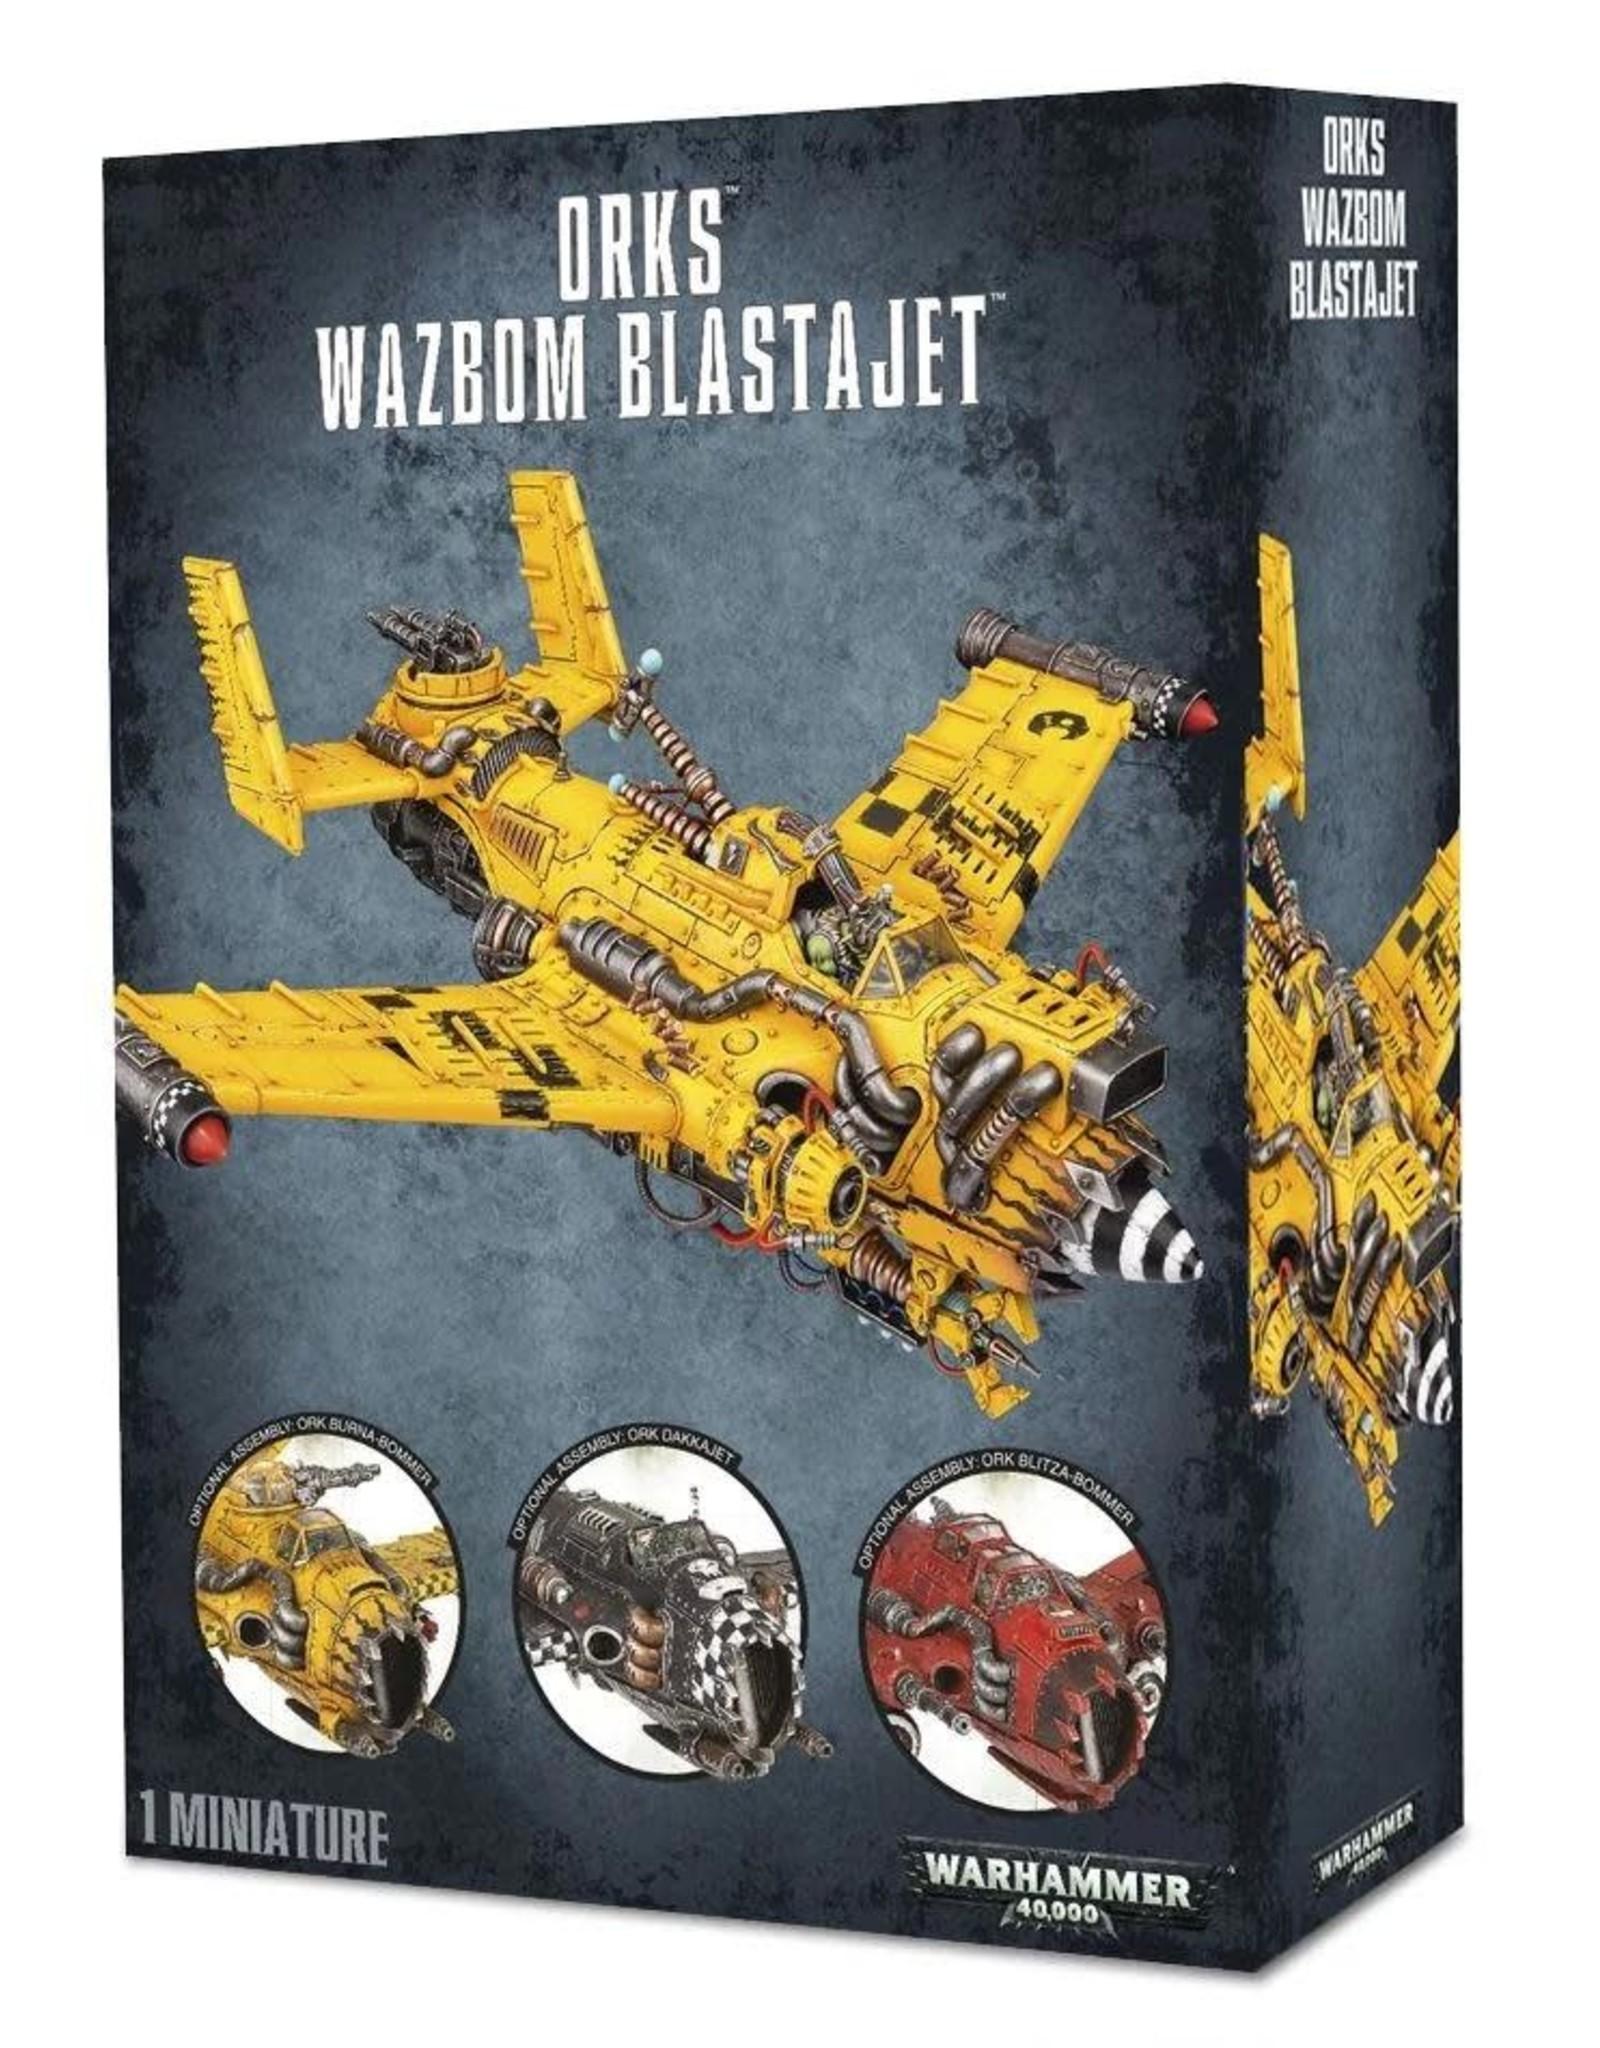 Warhammer 40K Ork Wazbom Blastajet/Burna-Bommer/Dakkajet